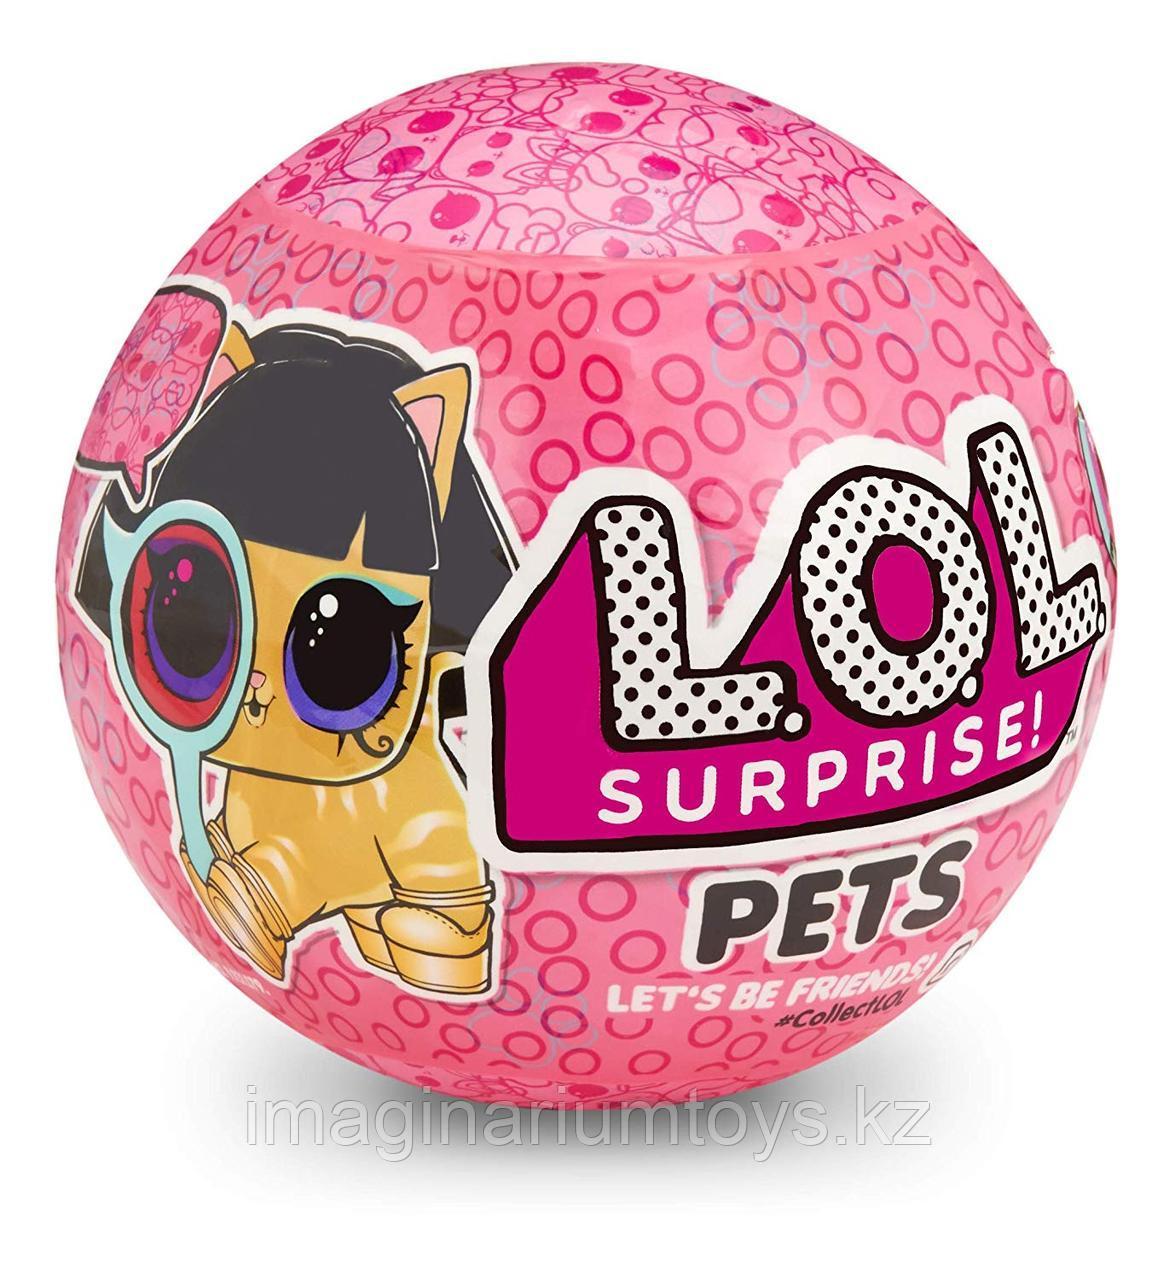 ЛОЛ питомцы L.O.L. Pets